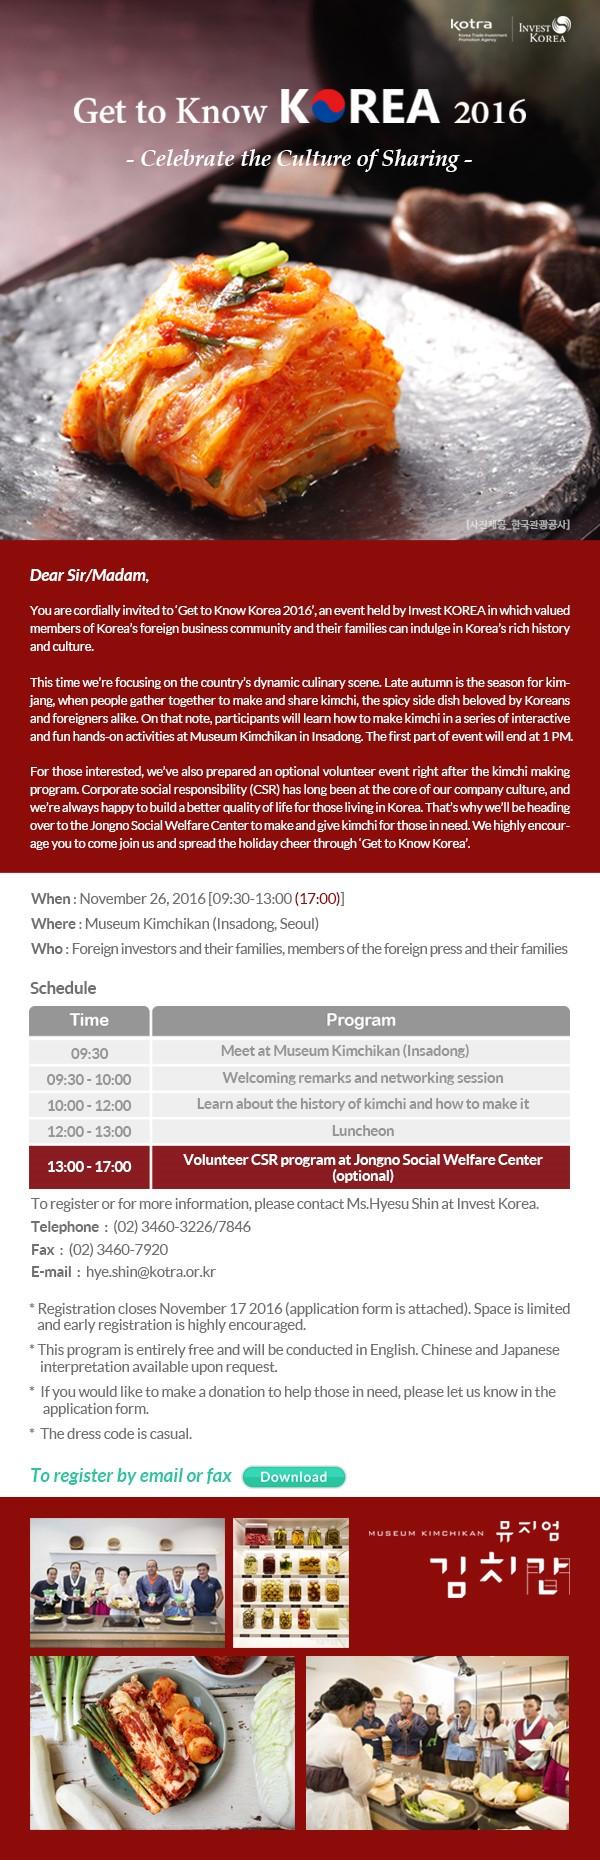 get to know korea 2016